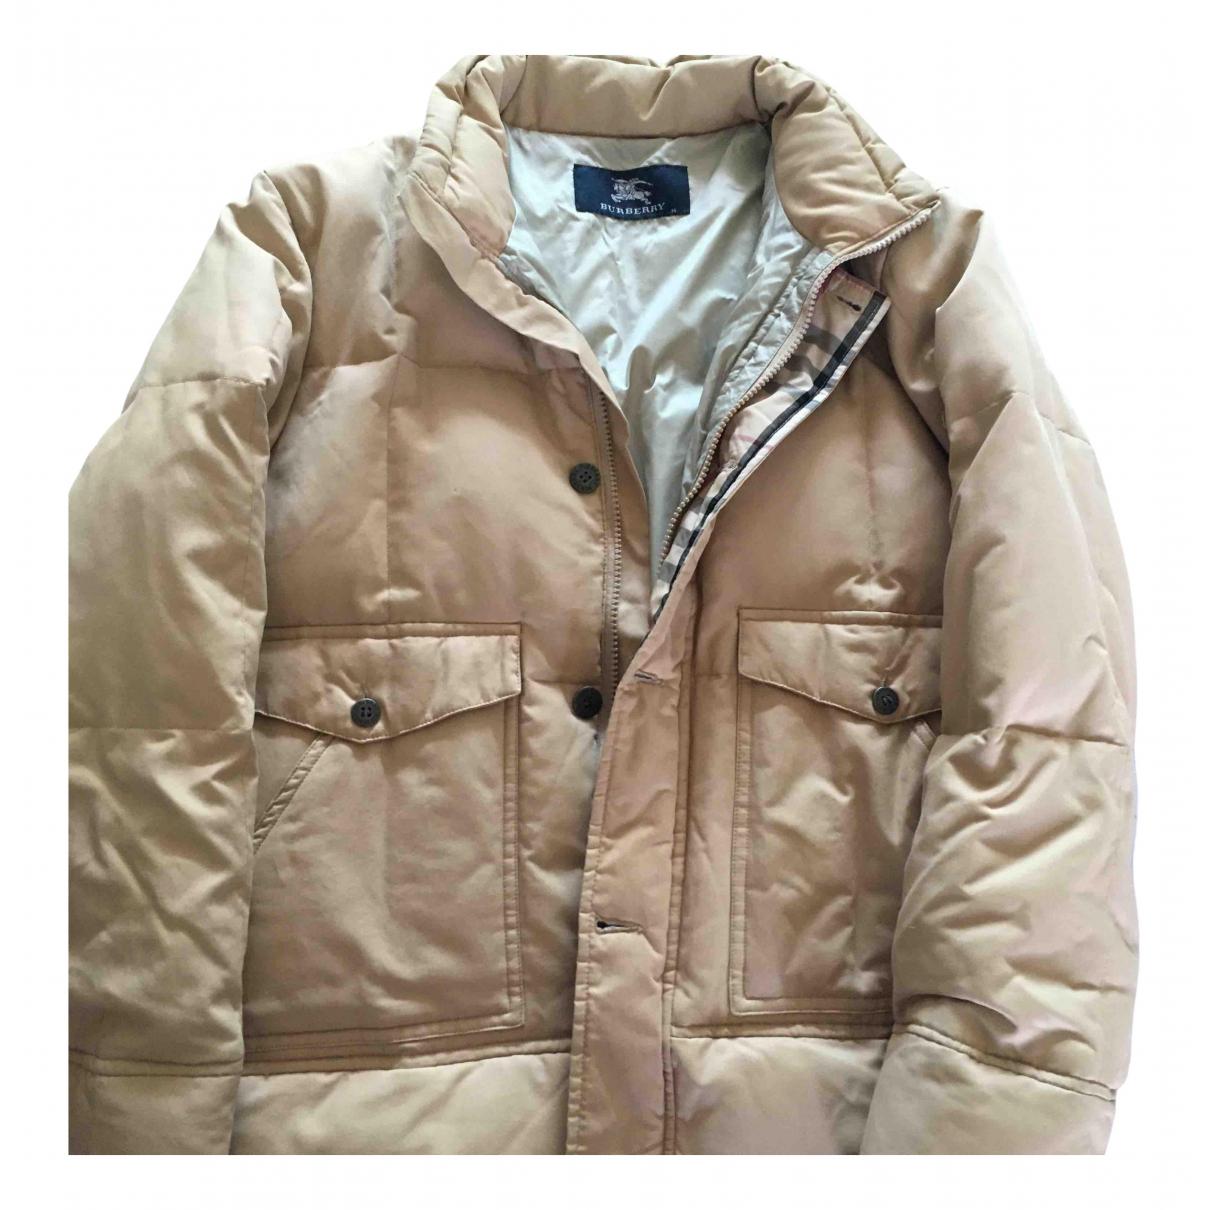 Burberry \N Beige jacket & coat for Kids 14 years - S FR